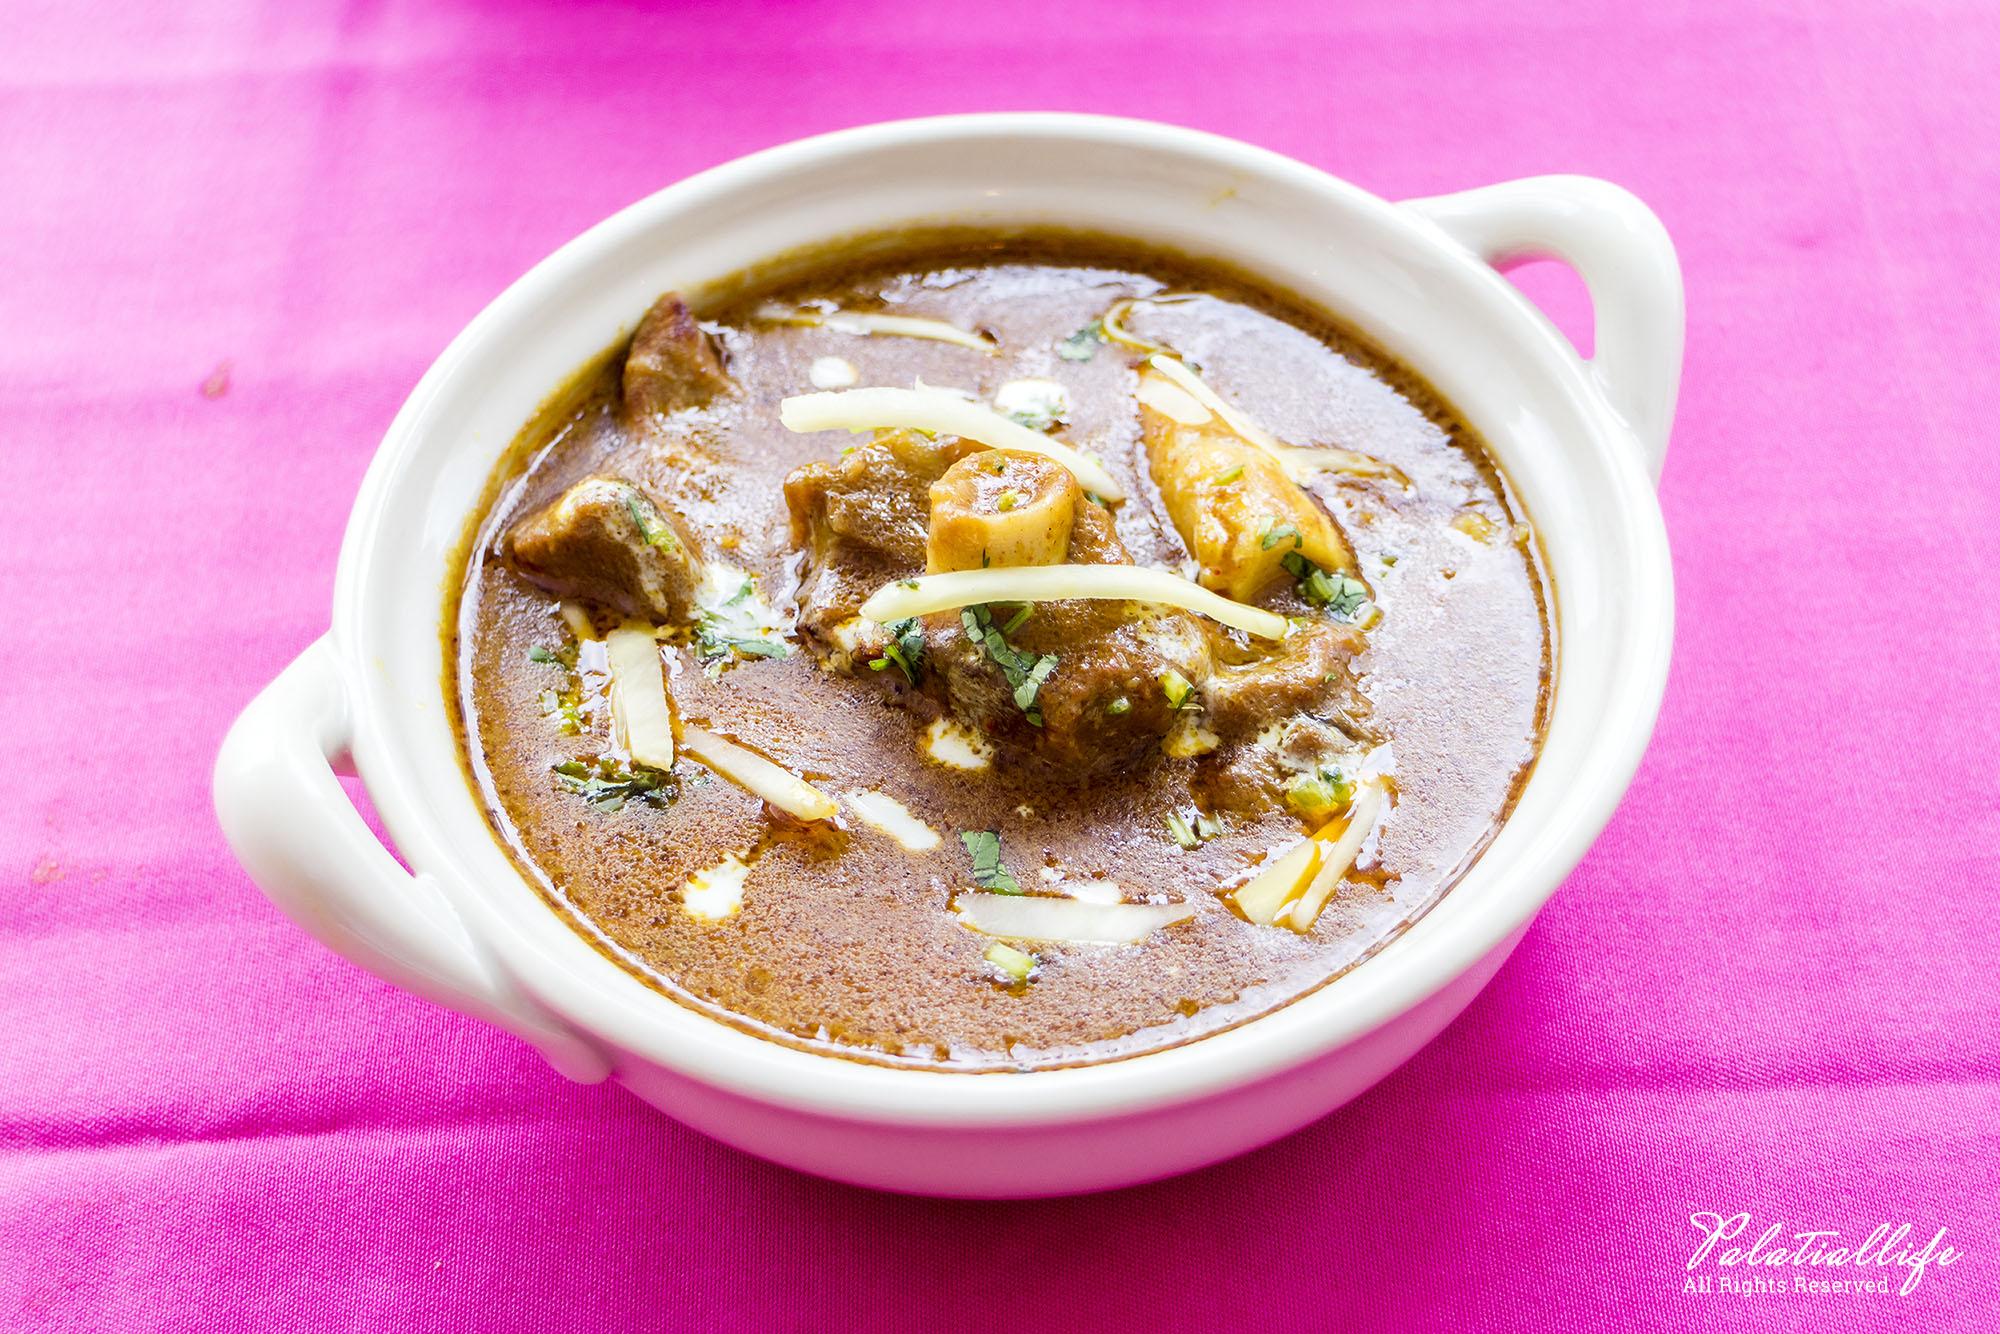 Nihari Gosht  Coco's Cafe โรงแรม Bangkok Hotel Lotus Sukhumvit ชวนไปลิ้มลองอาหารอินเดียพิเศษ IMG 0159